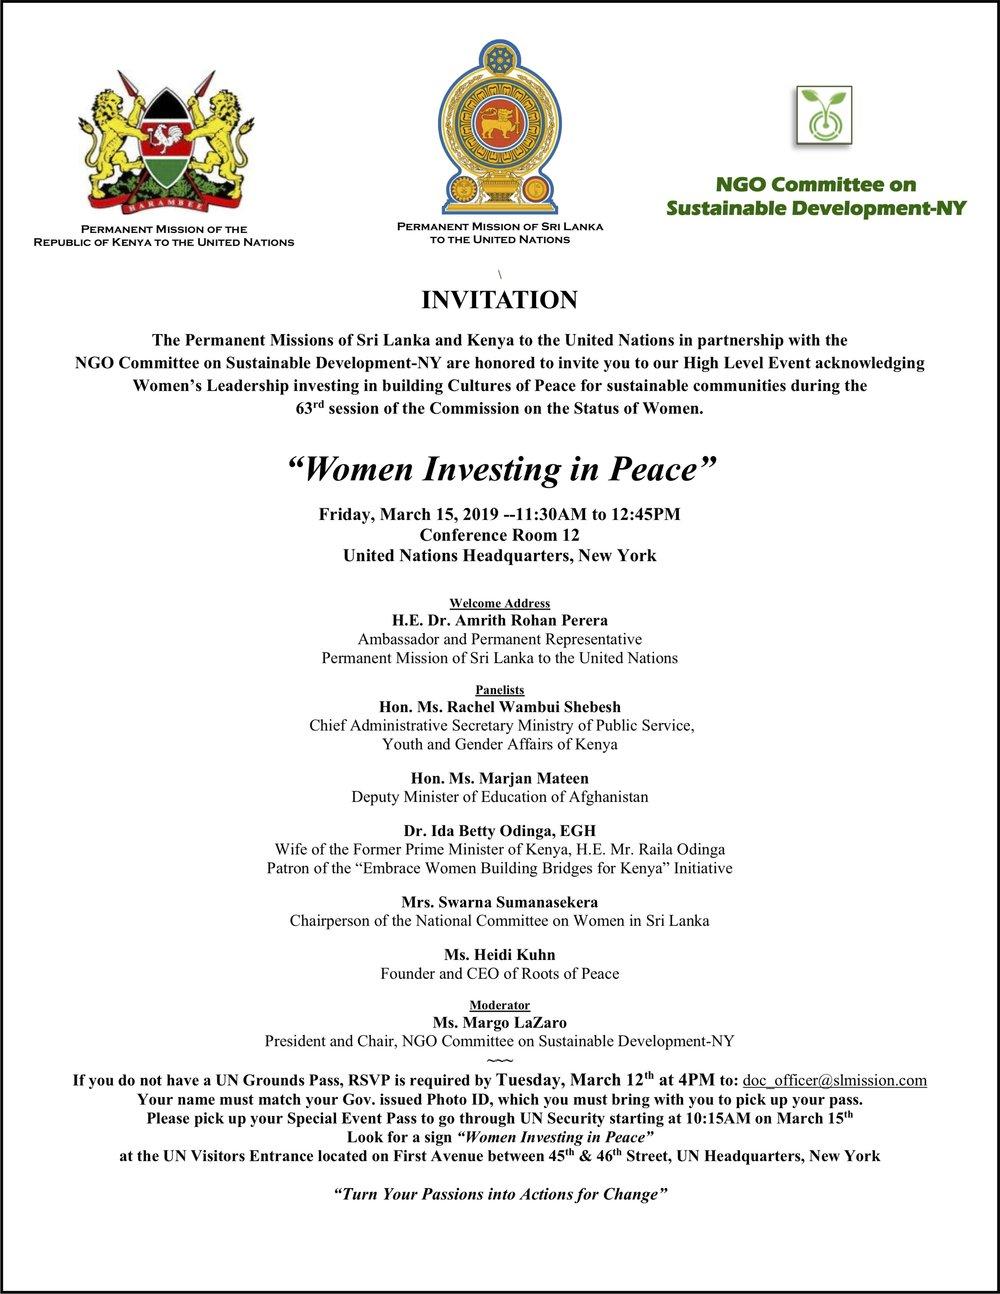 NGOCSD-NY-Sri+Lanka-Kenya-Women+Investing+in+Peace+3-15-19+D4222.jpg